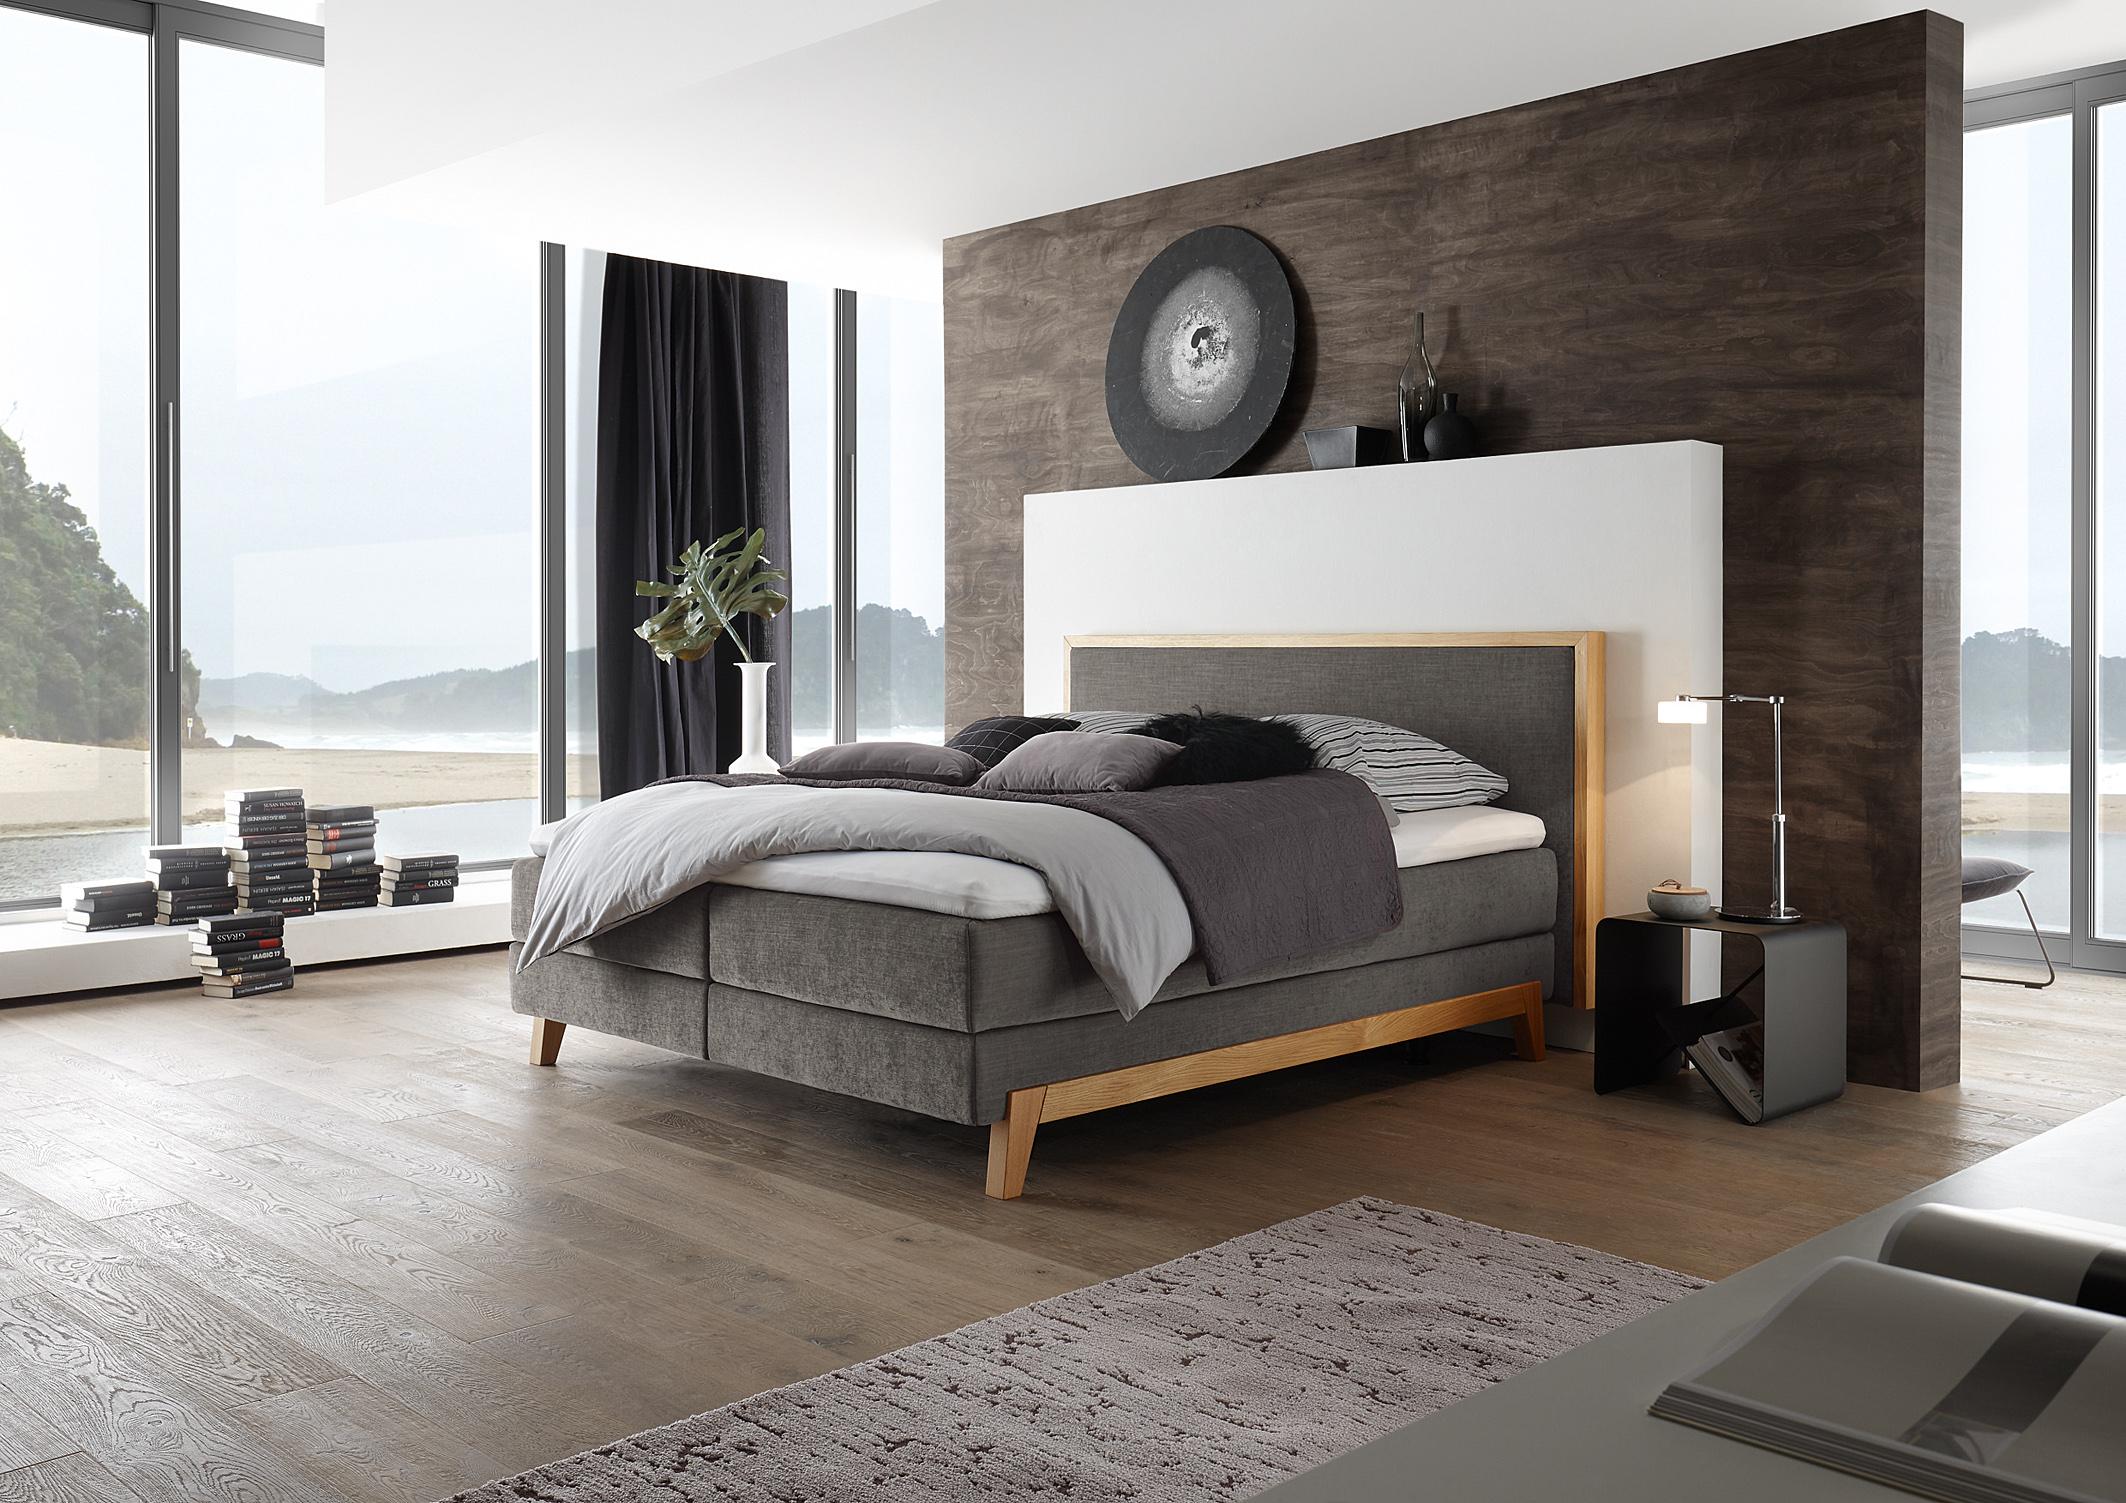 pm 2017 dgm boxspringlabel2. Black Bedroom Furniture Sets. Home Design Ideas